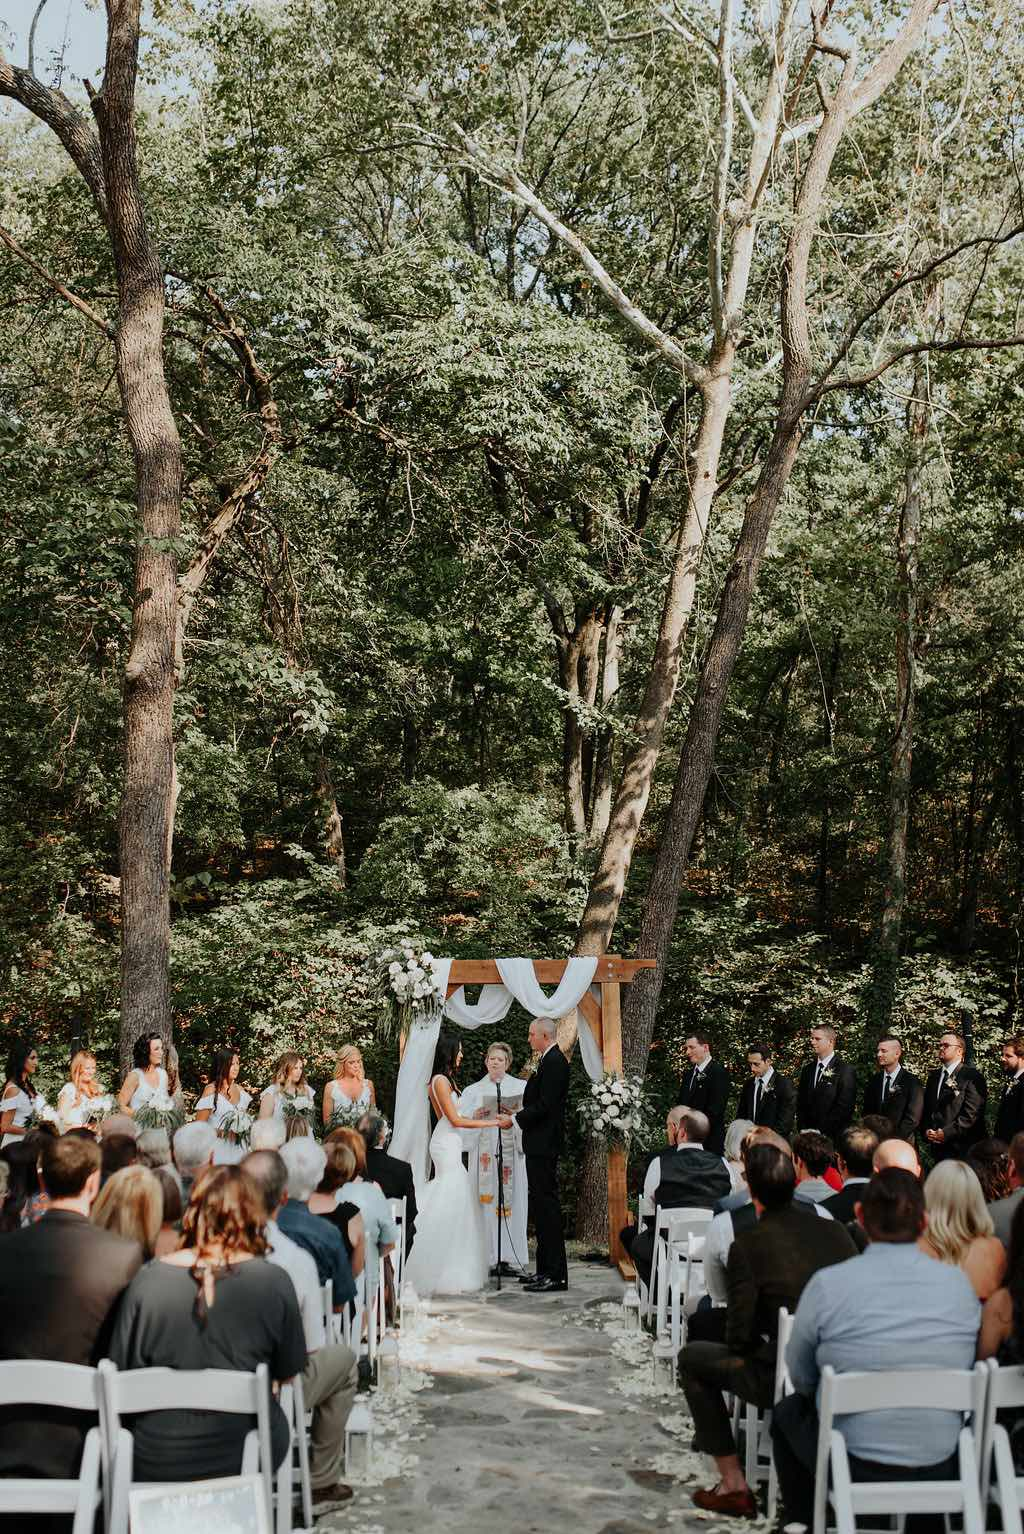 White Barn Courtyard Ceremony